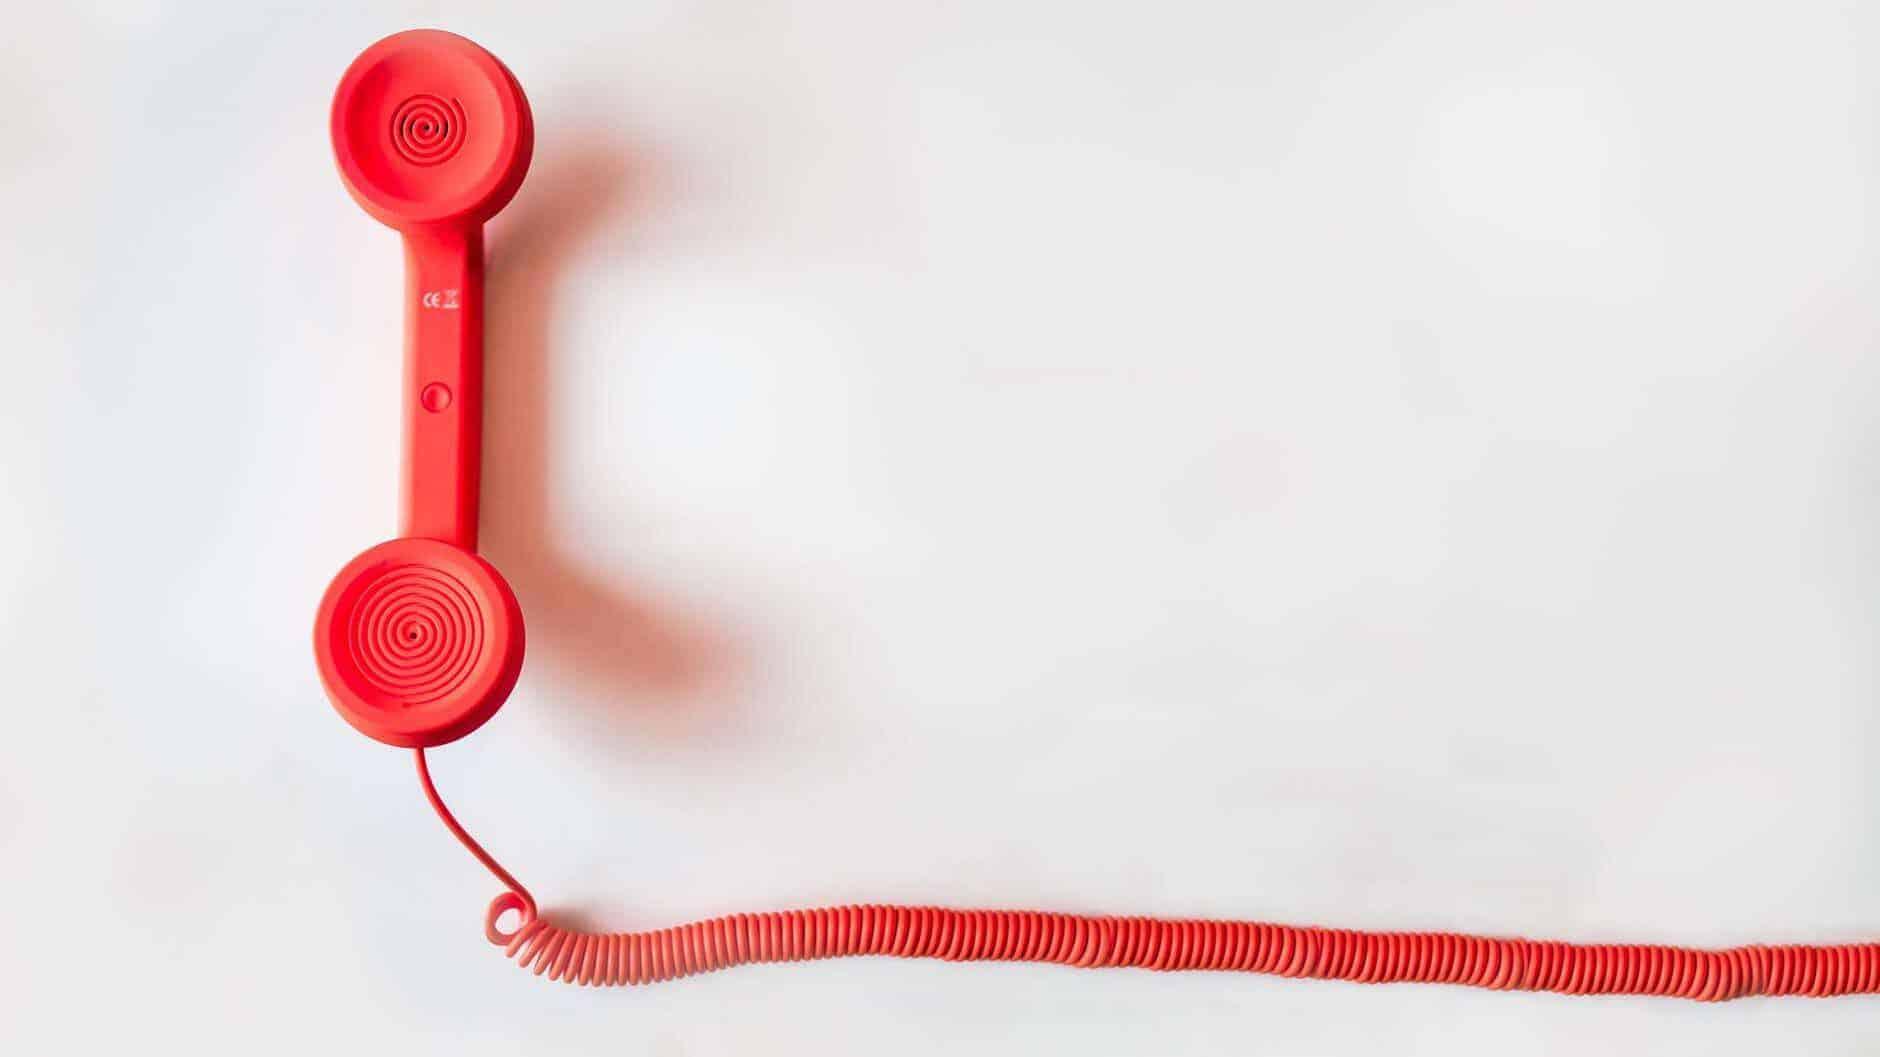 telemarketing definicja, telemarketing jako forma reklamy imarketingu